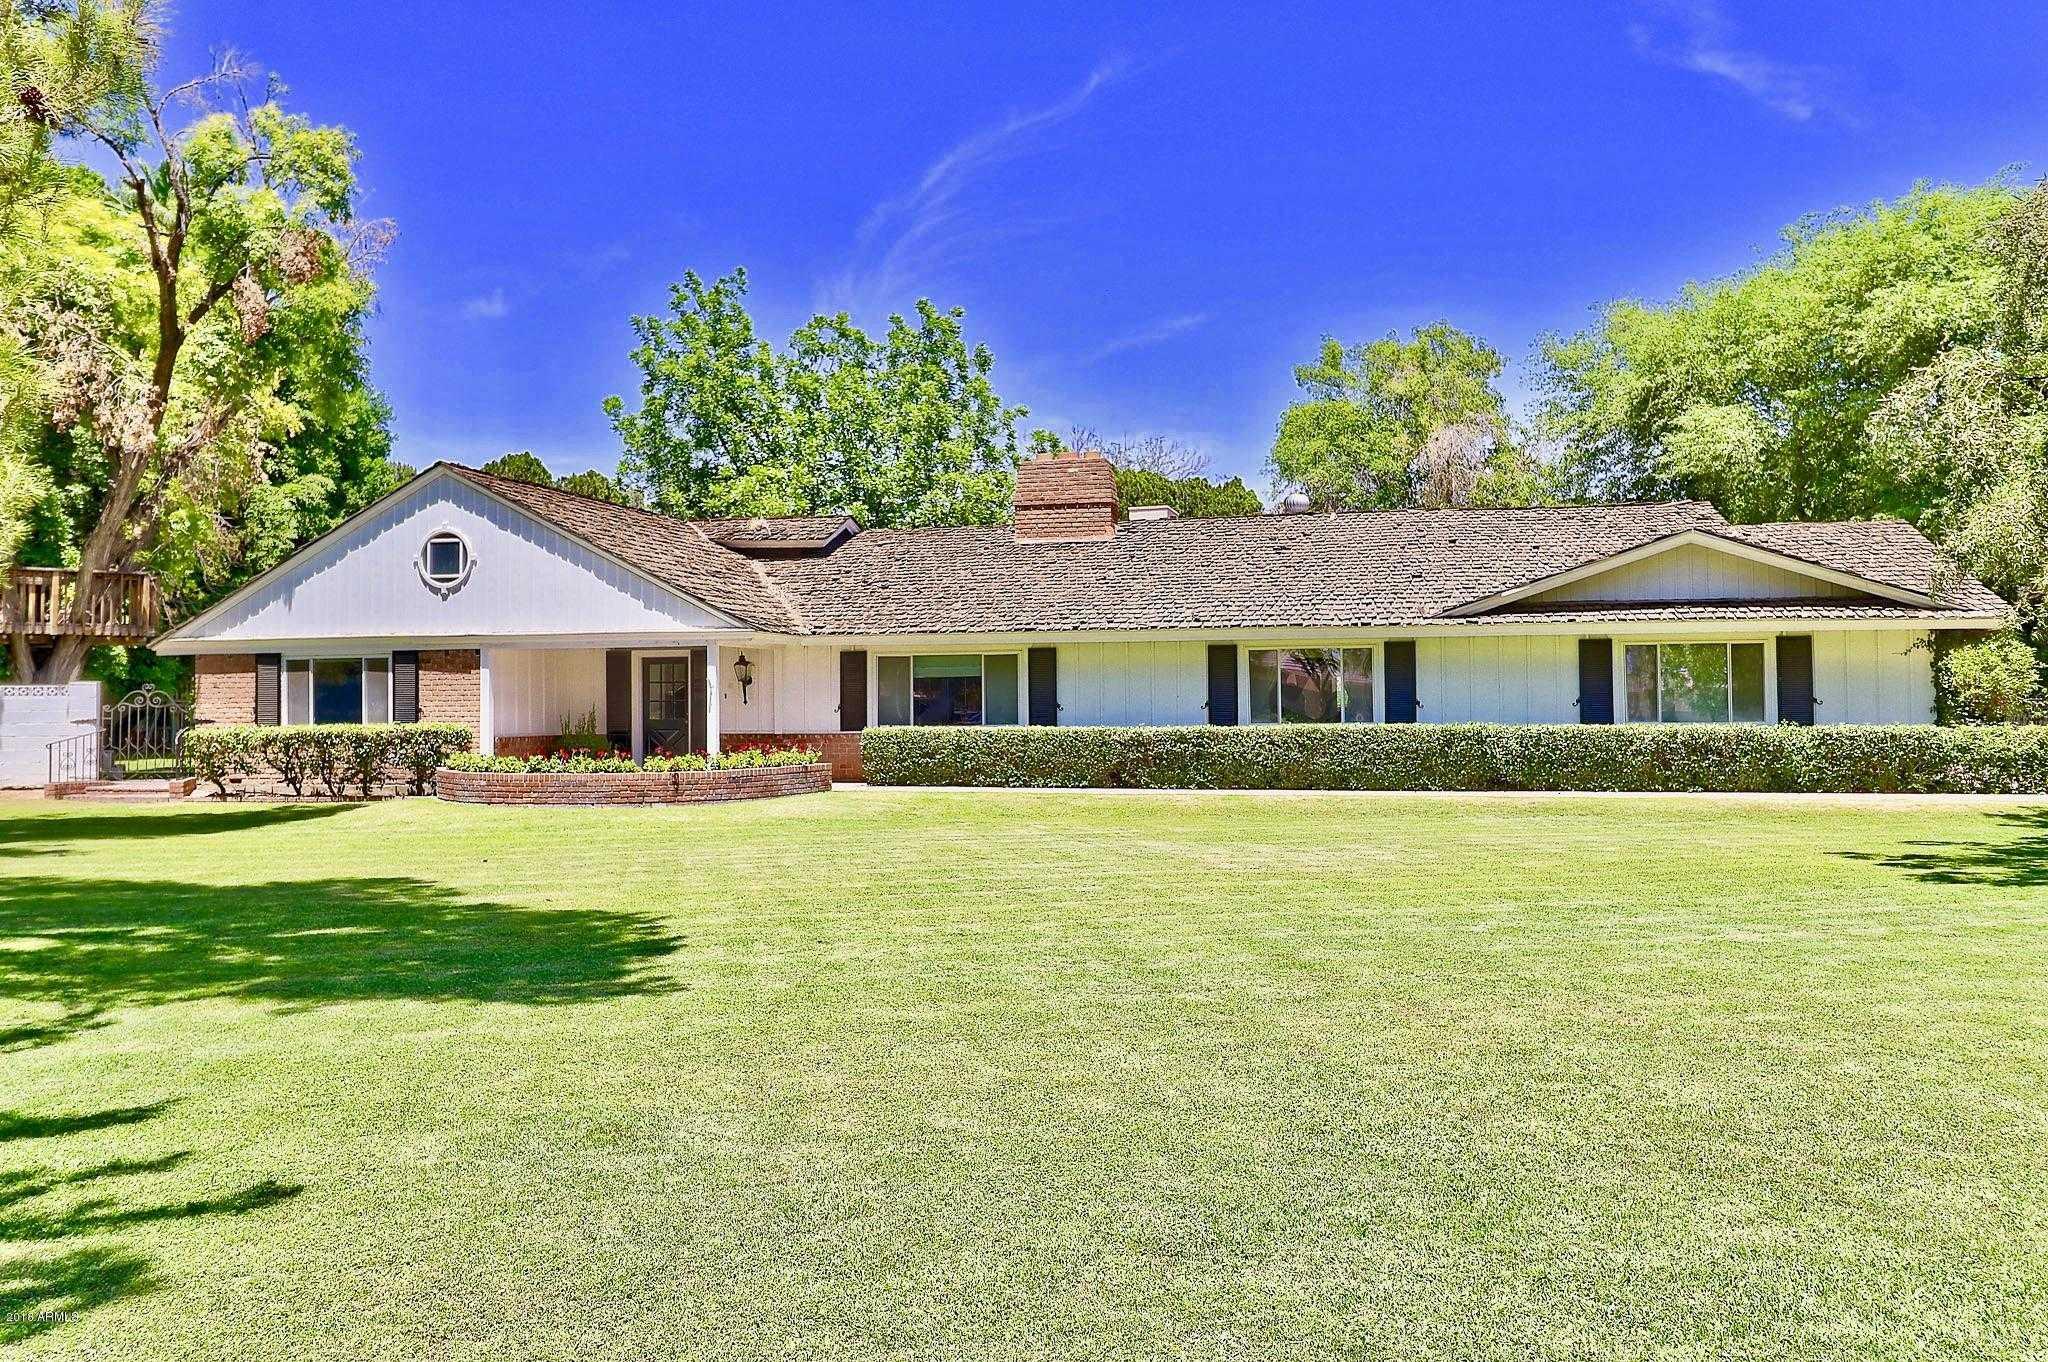 $1,750,000 - 5Br/4Ba - Home for Sale in Dana Estates, Scottsdale